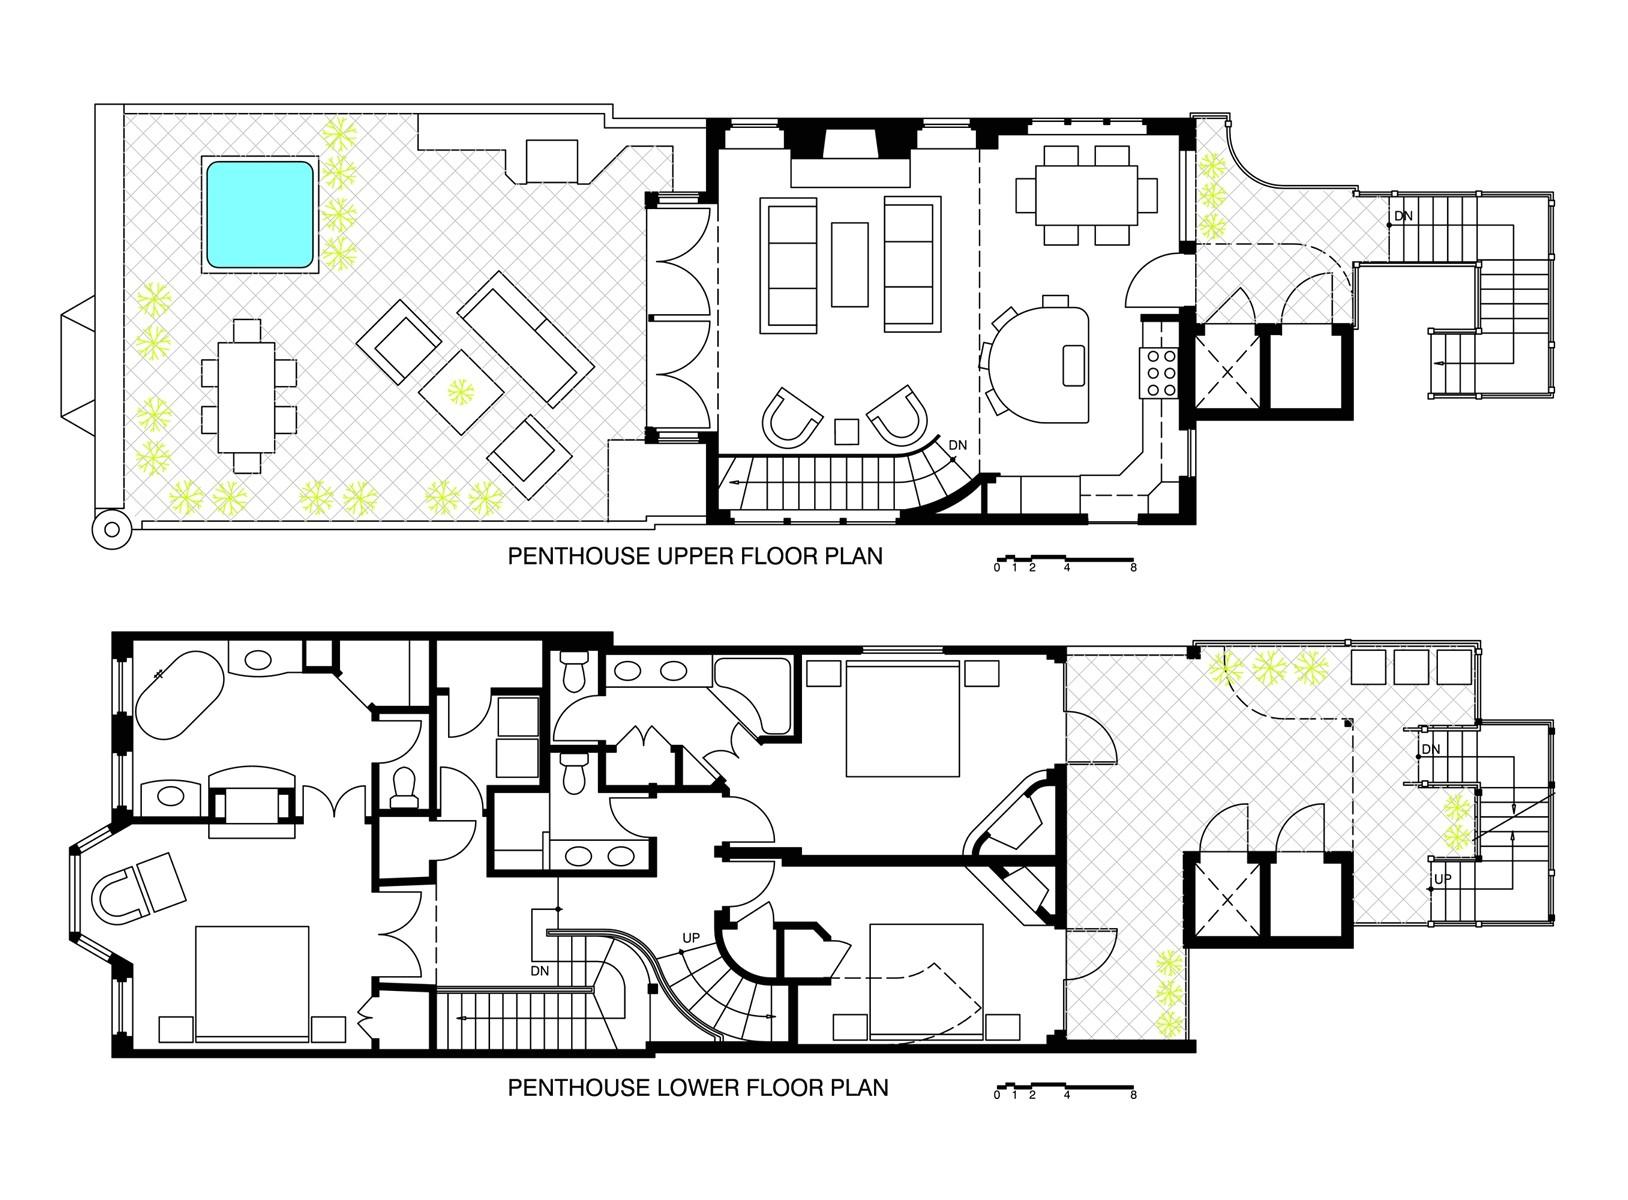 one story passive solar house plans unique new 4 bedroom home planscool bedroom house plans home design new